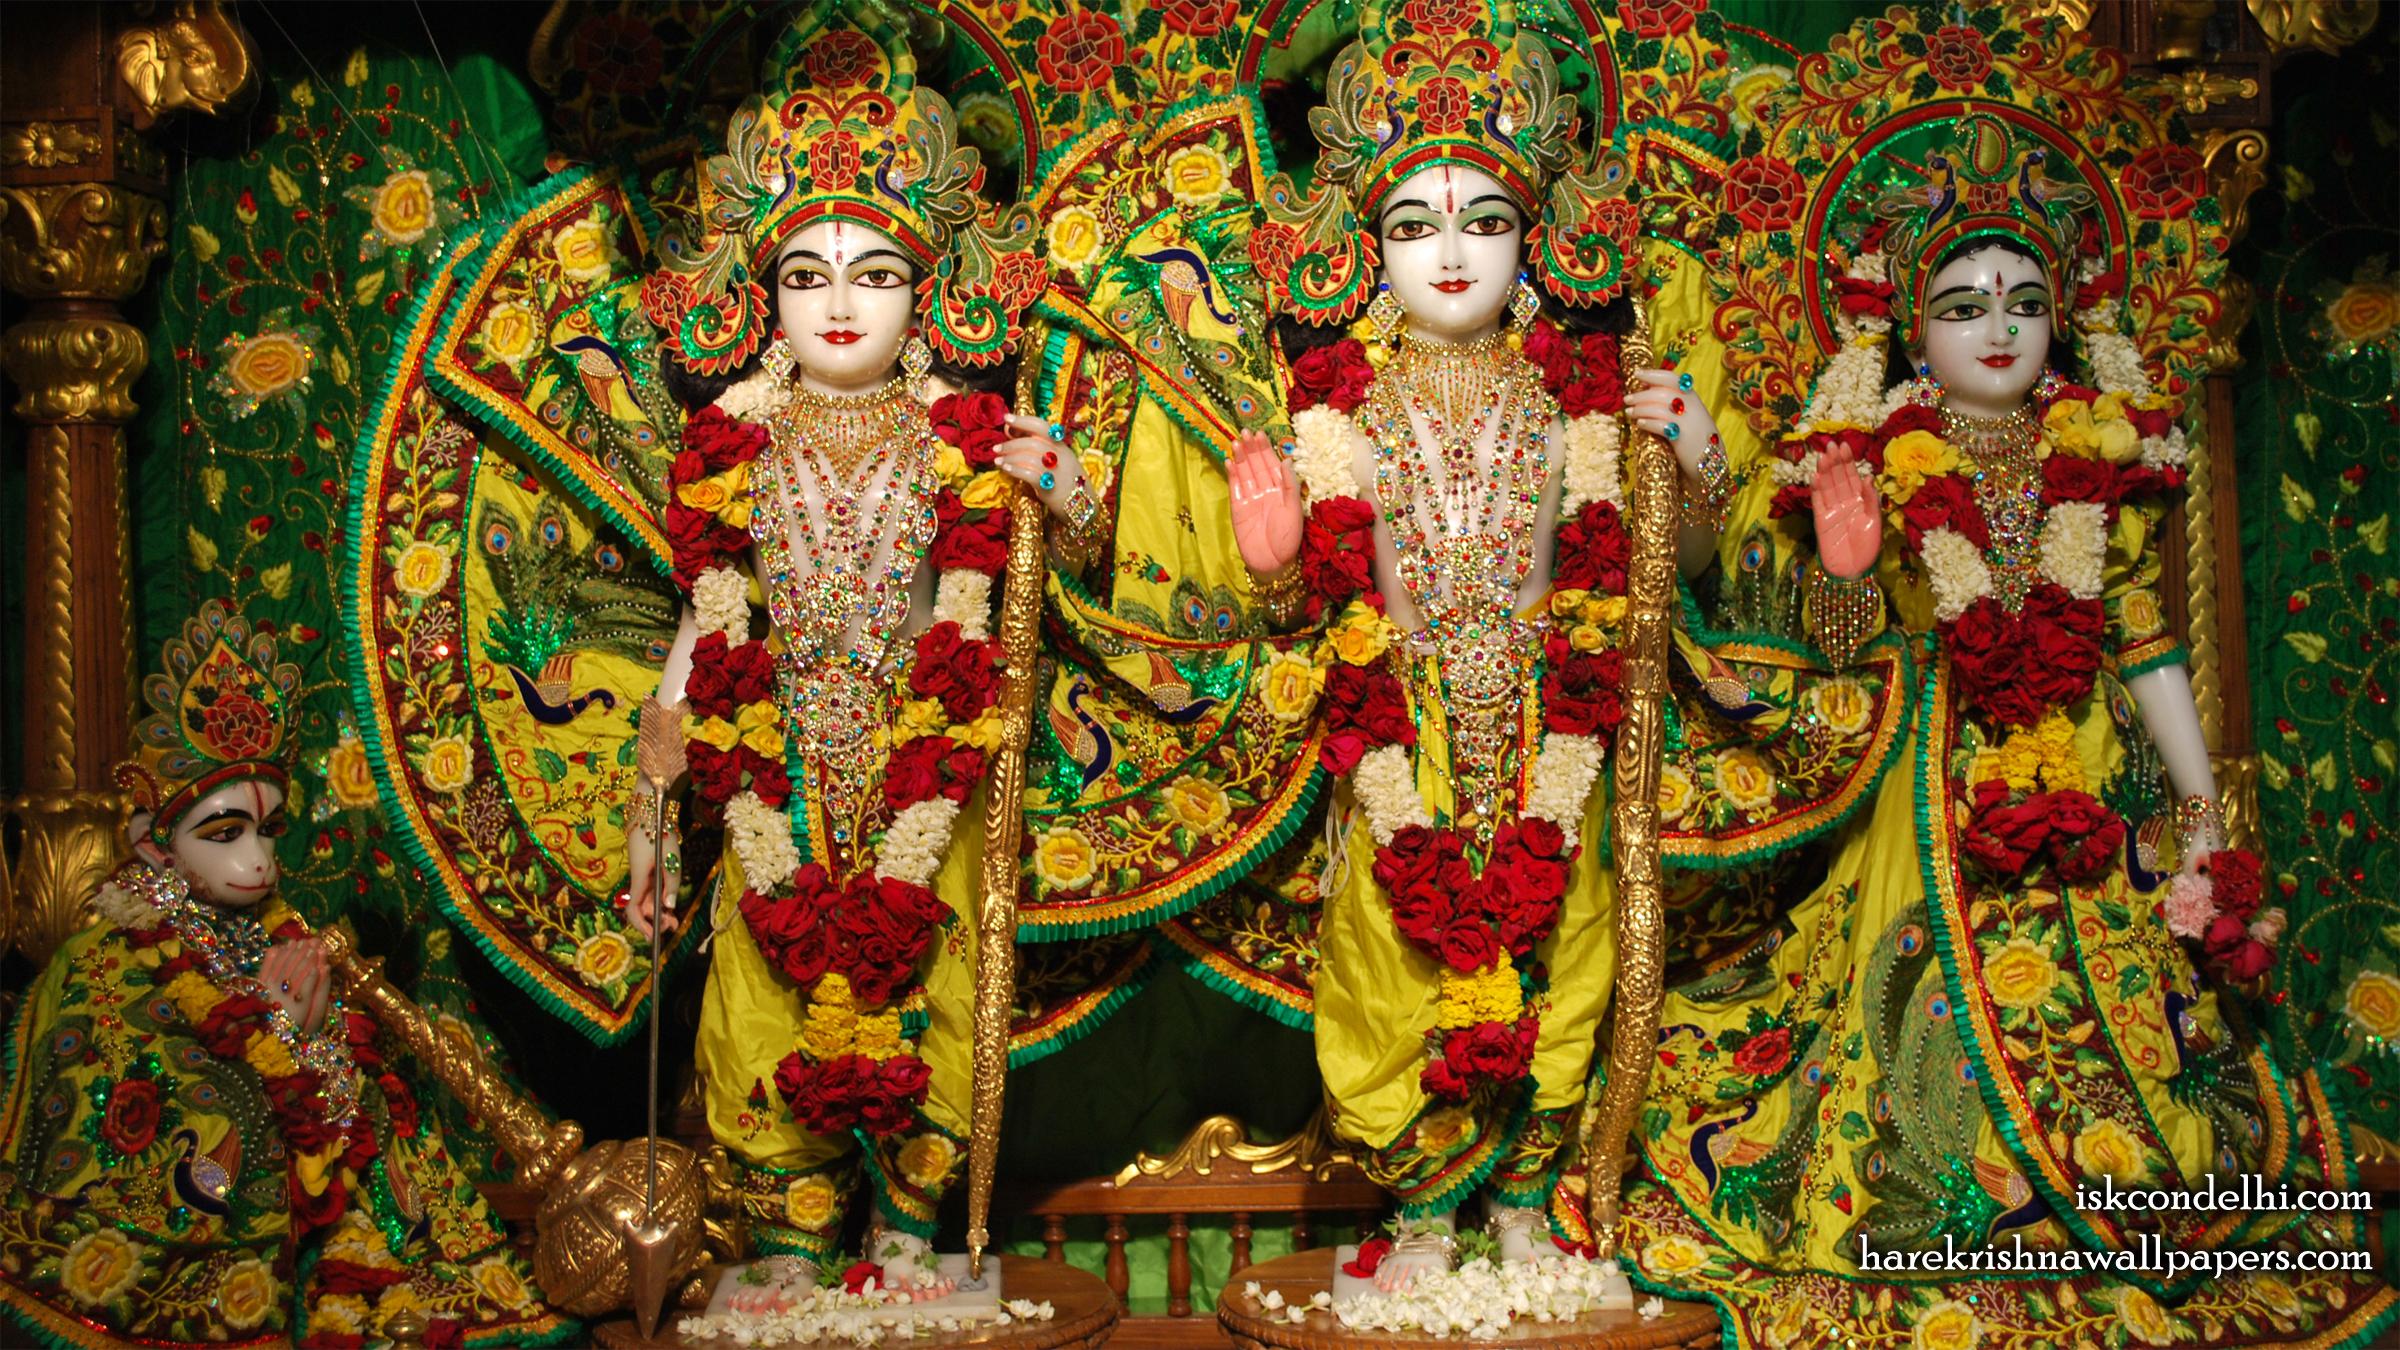 Sri Sri Sita Rama Laxman Hanuman Wallpaper (015) Size 2400x1350 Download